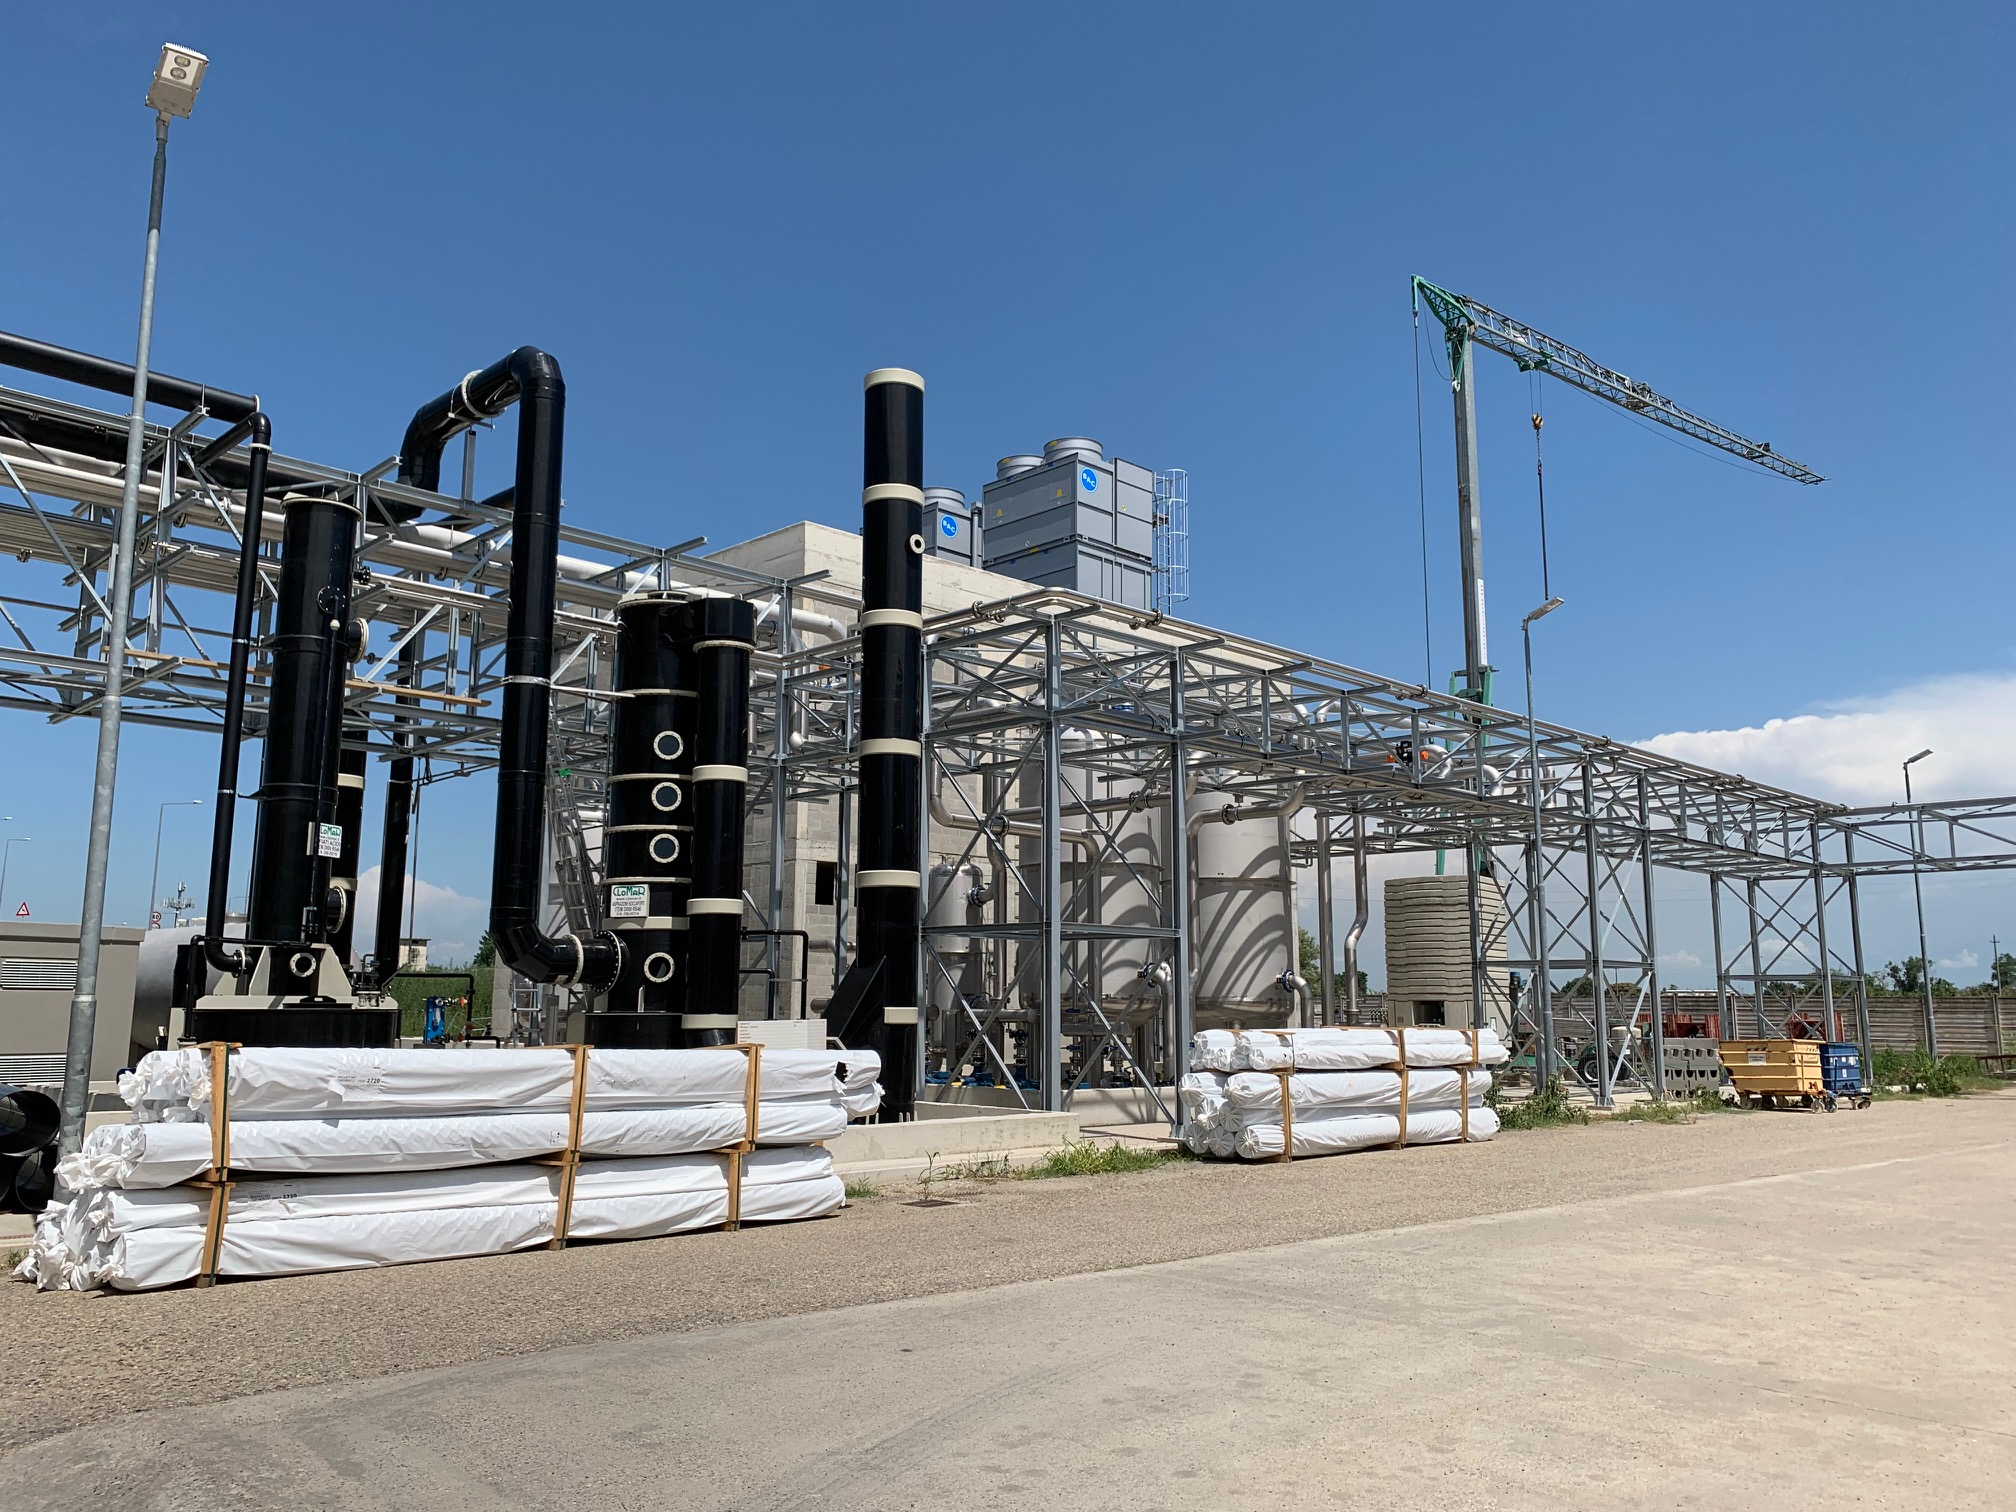 FarmaBios – Update on constructions at Gropello Cairoli (Italy)